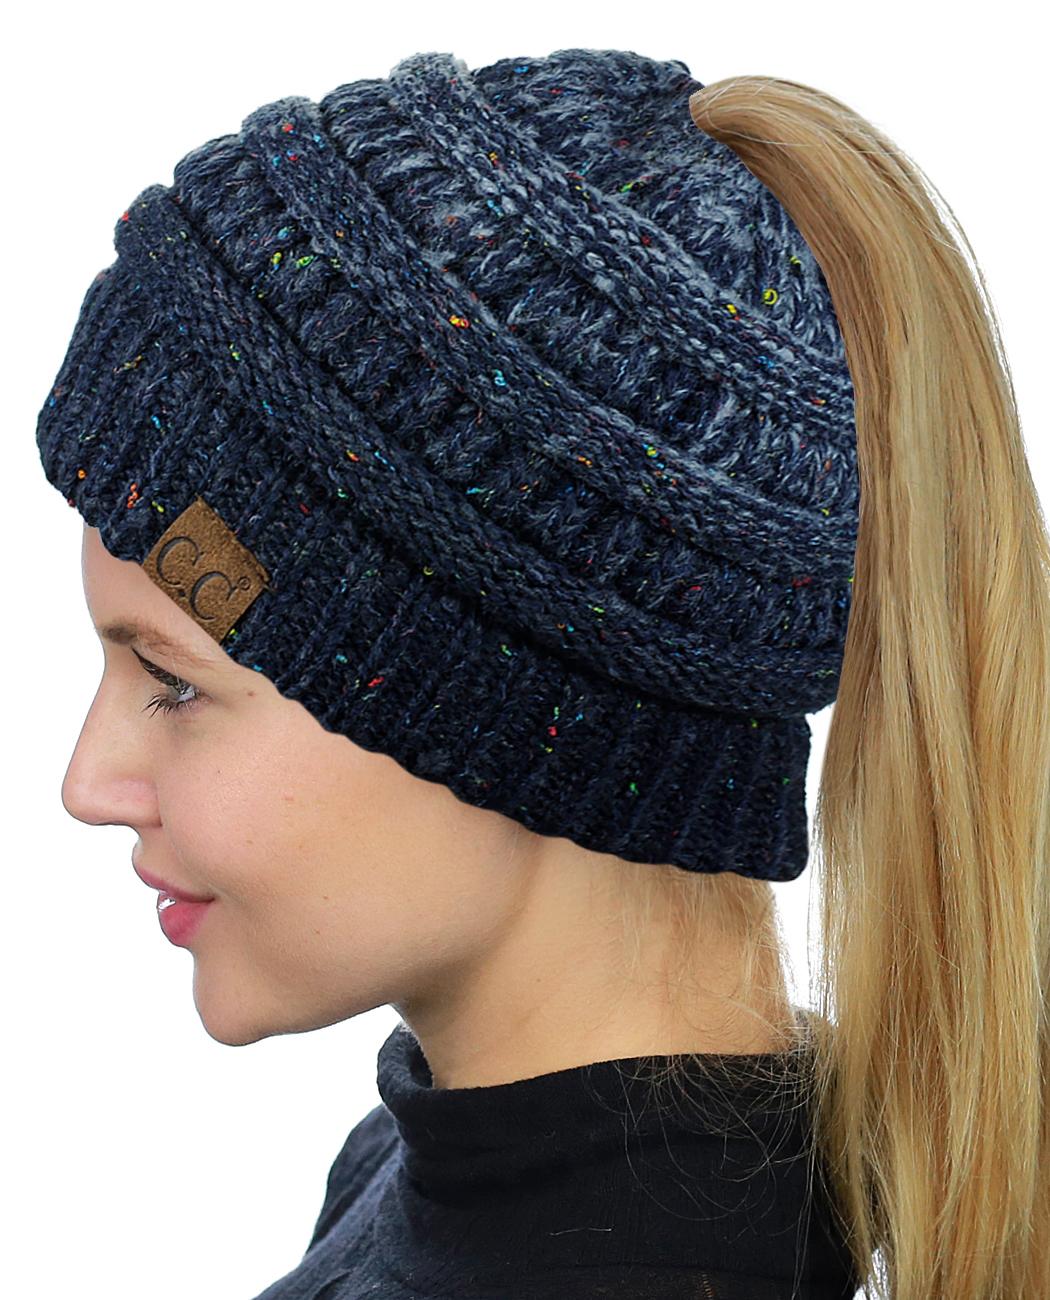 C.C BeanieTail Soft Stretch Cable Knit Messy High Bun Ponytail Beanie Hat 12db11abdb3